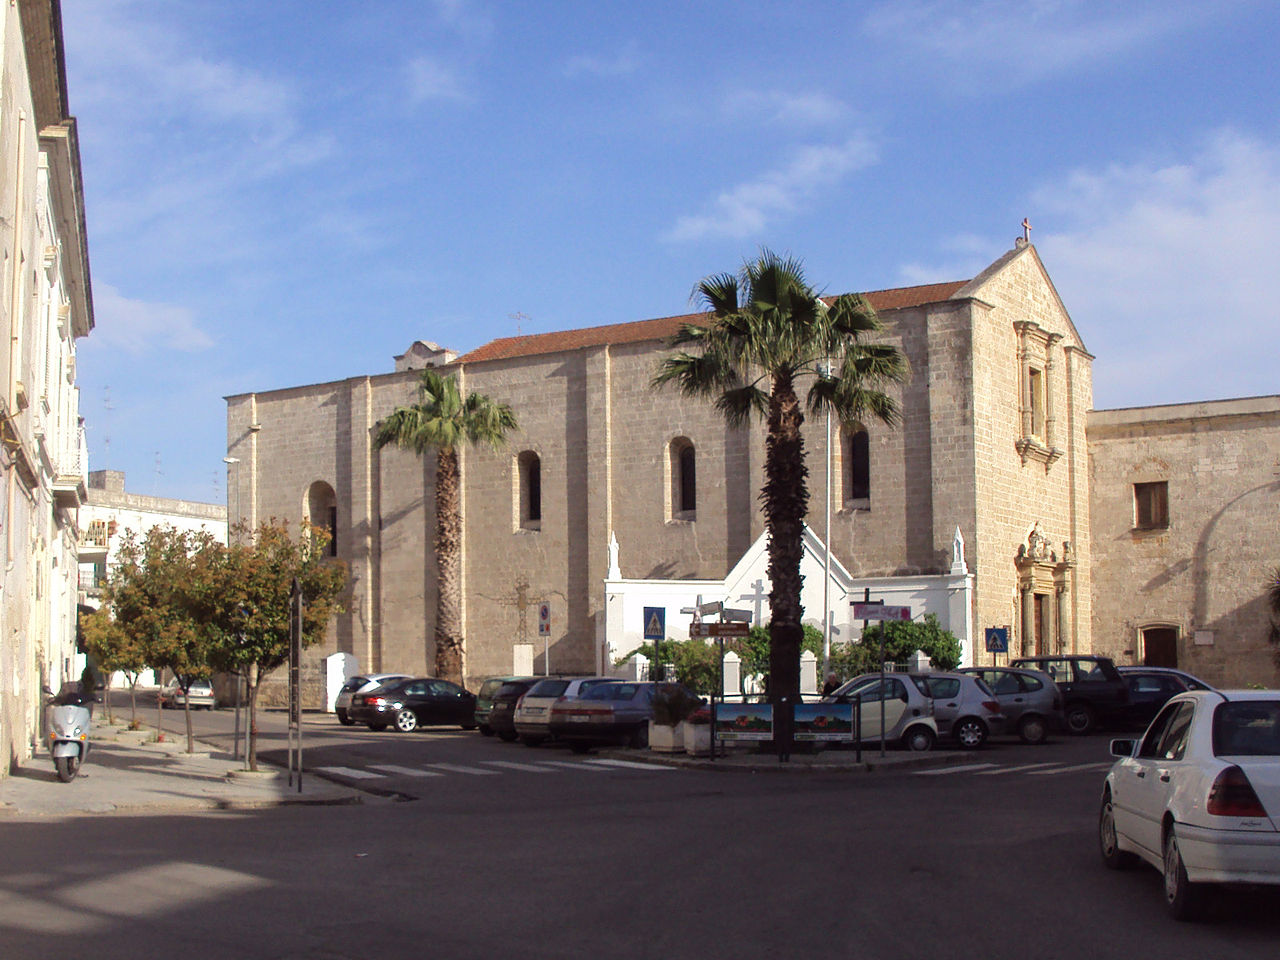 Kirche und Kloster Santa Maria delle Grazie